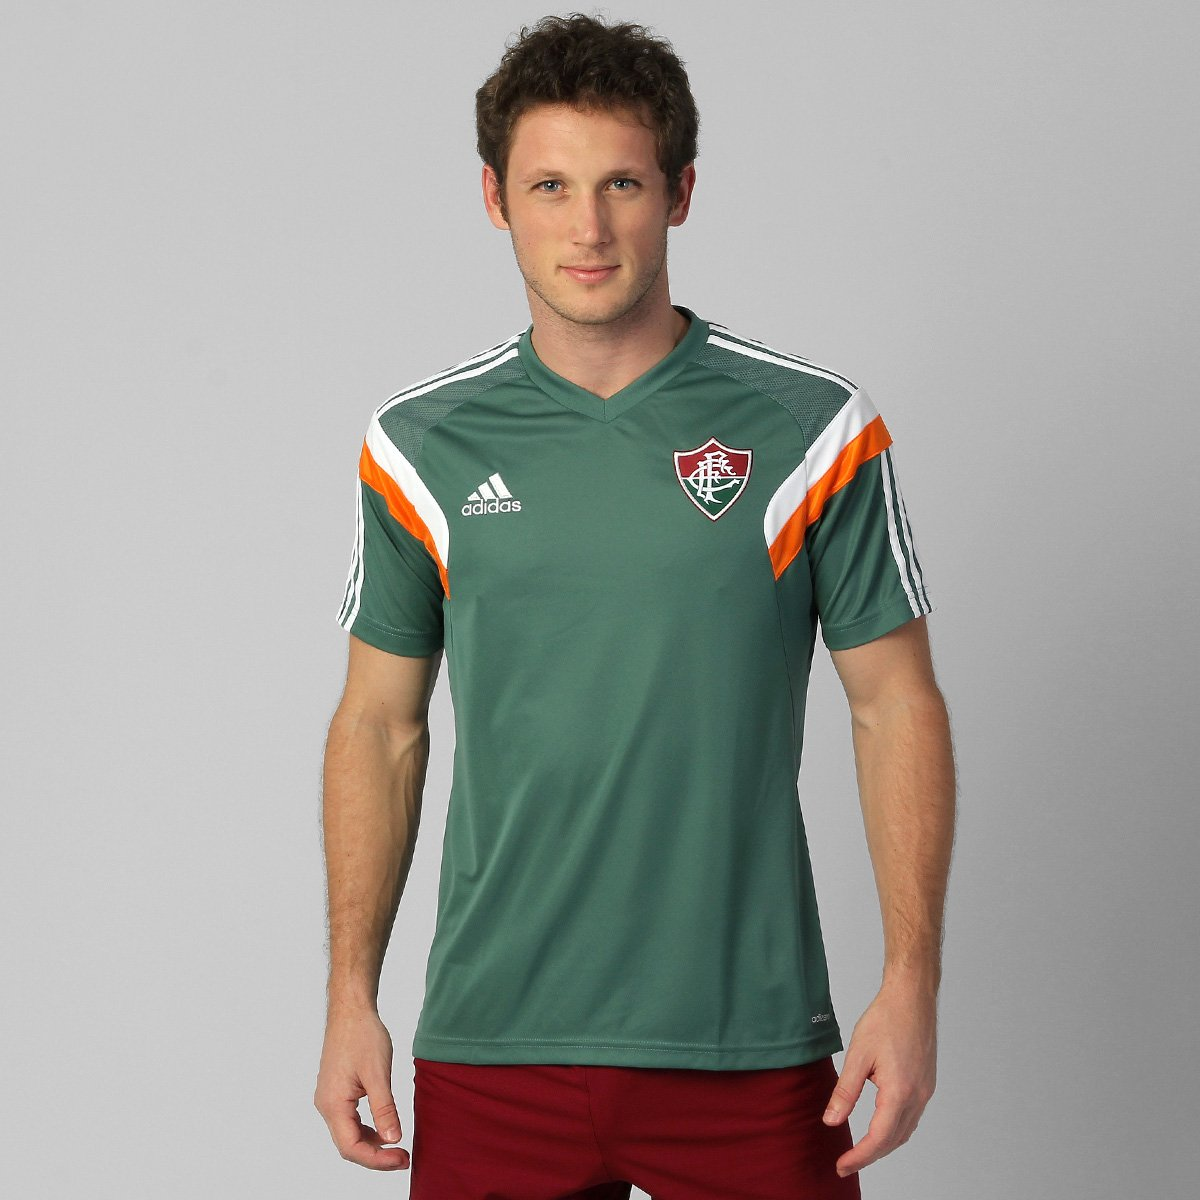 3268476057 Camisa Adidas Fluminense Treino 2014 - Compre Agora